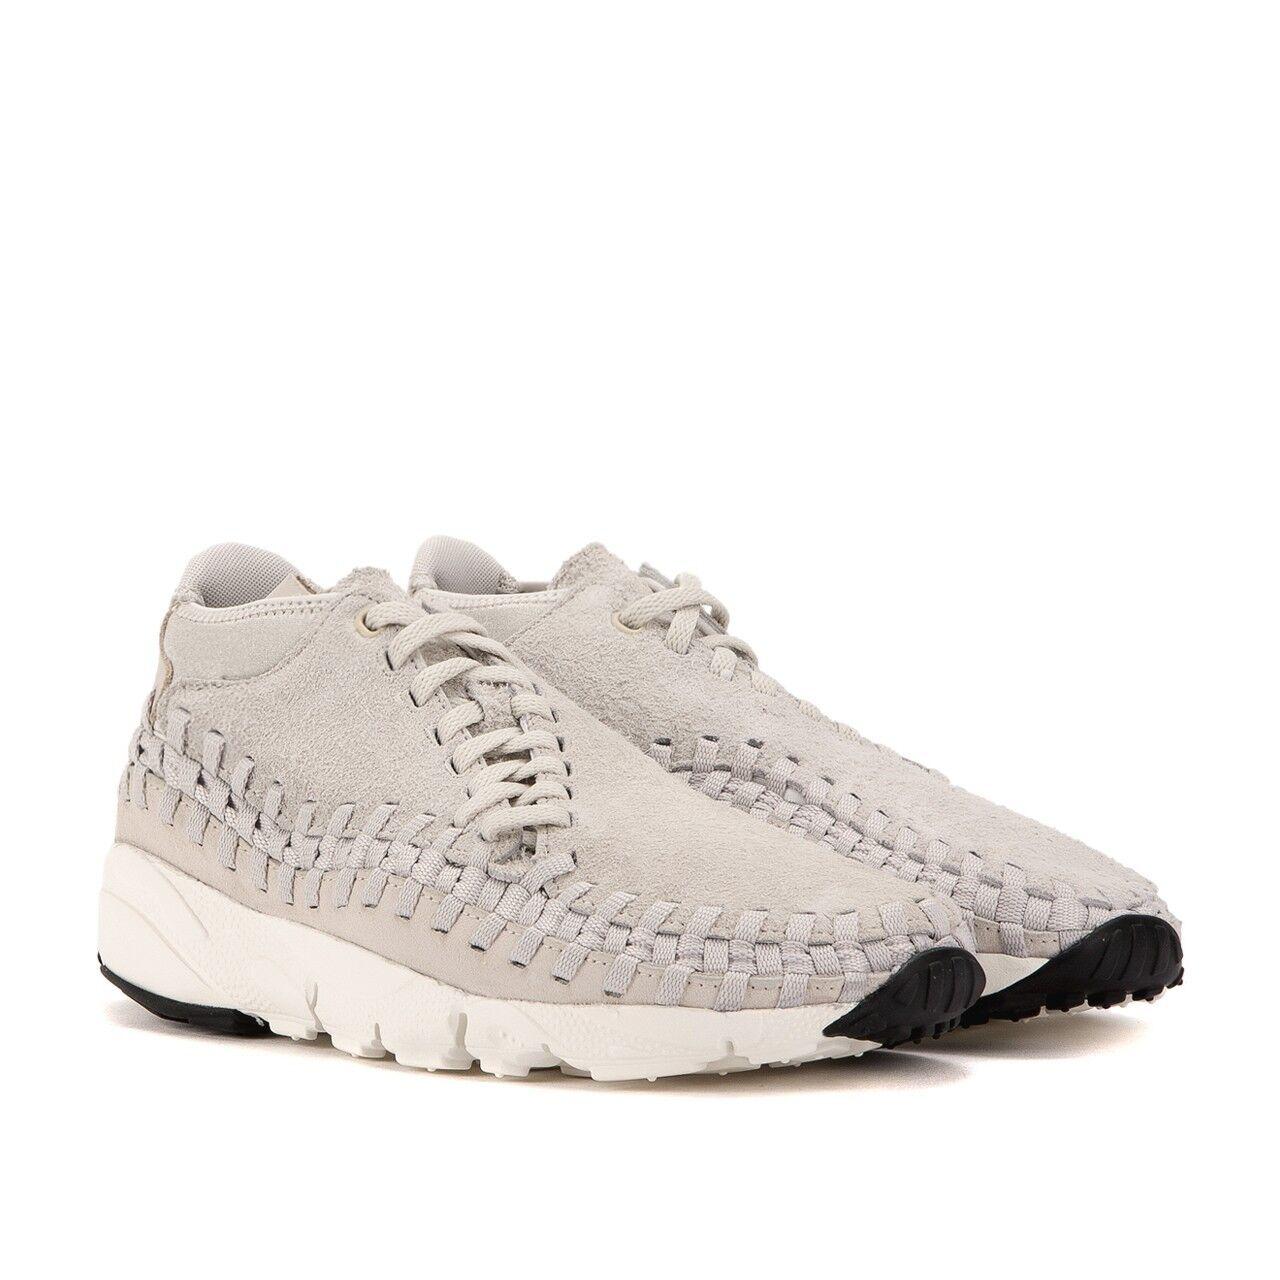 New Men's Nike Air Footscape Woven Chukka QS Light Bone White 913929-002